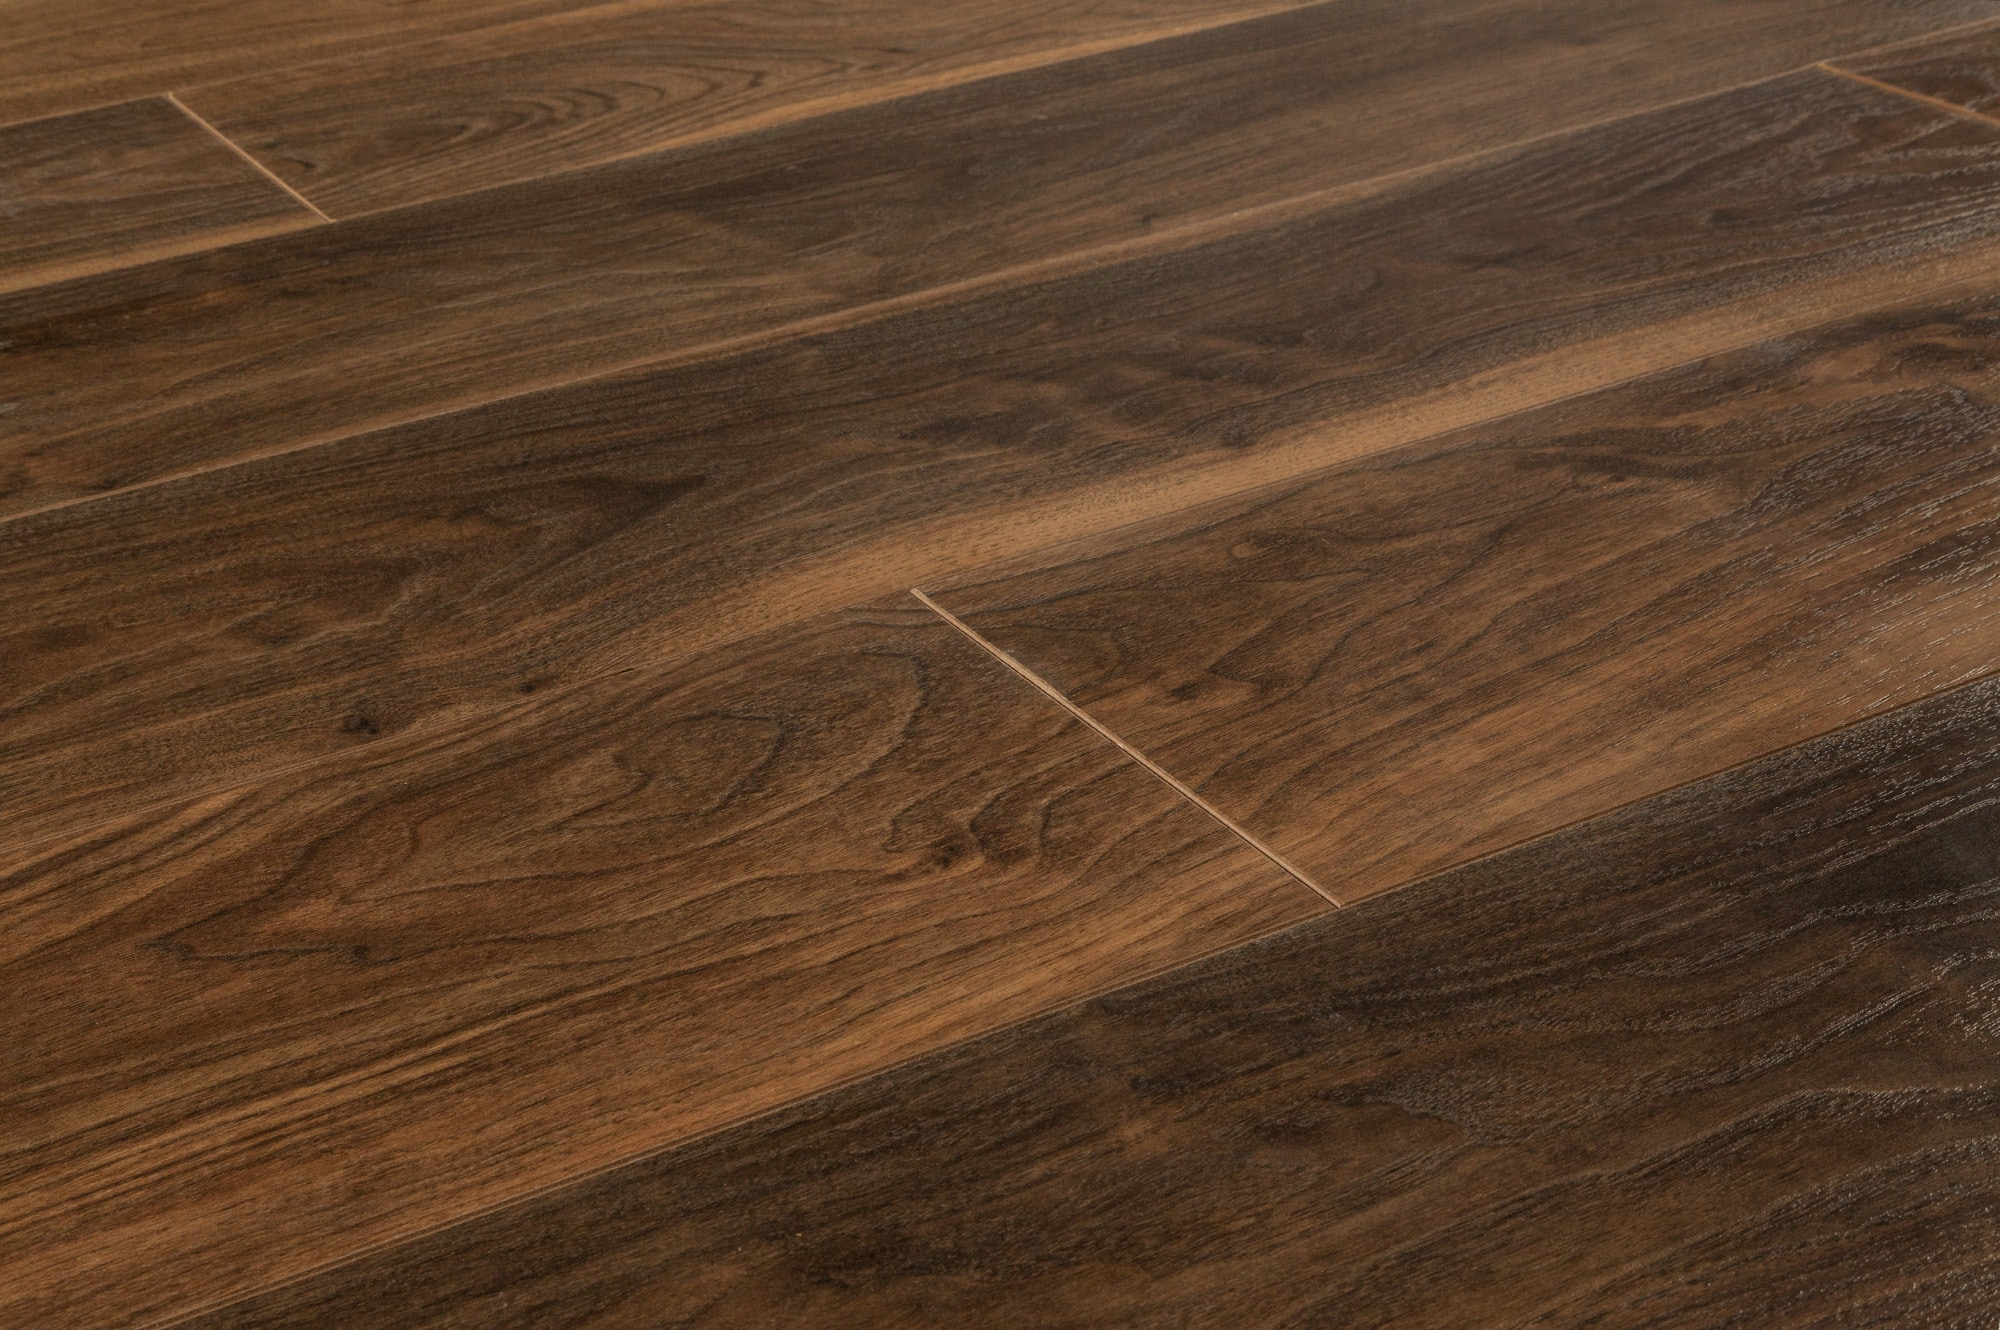 Lamton laminate 12mm american walnut collection charcoal for Walnut laminate flooring